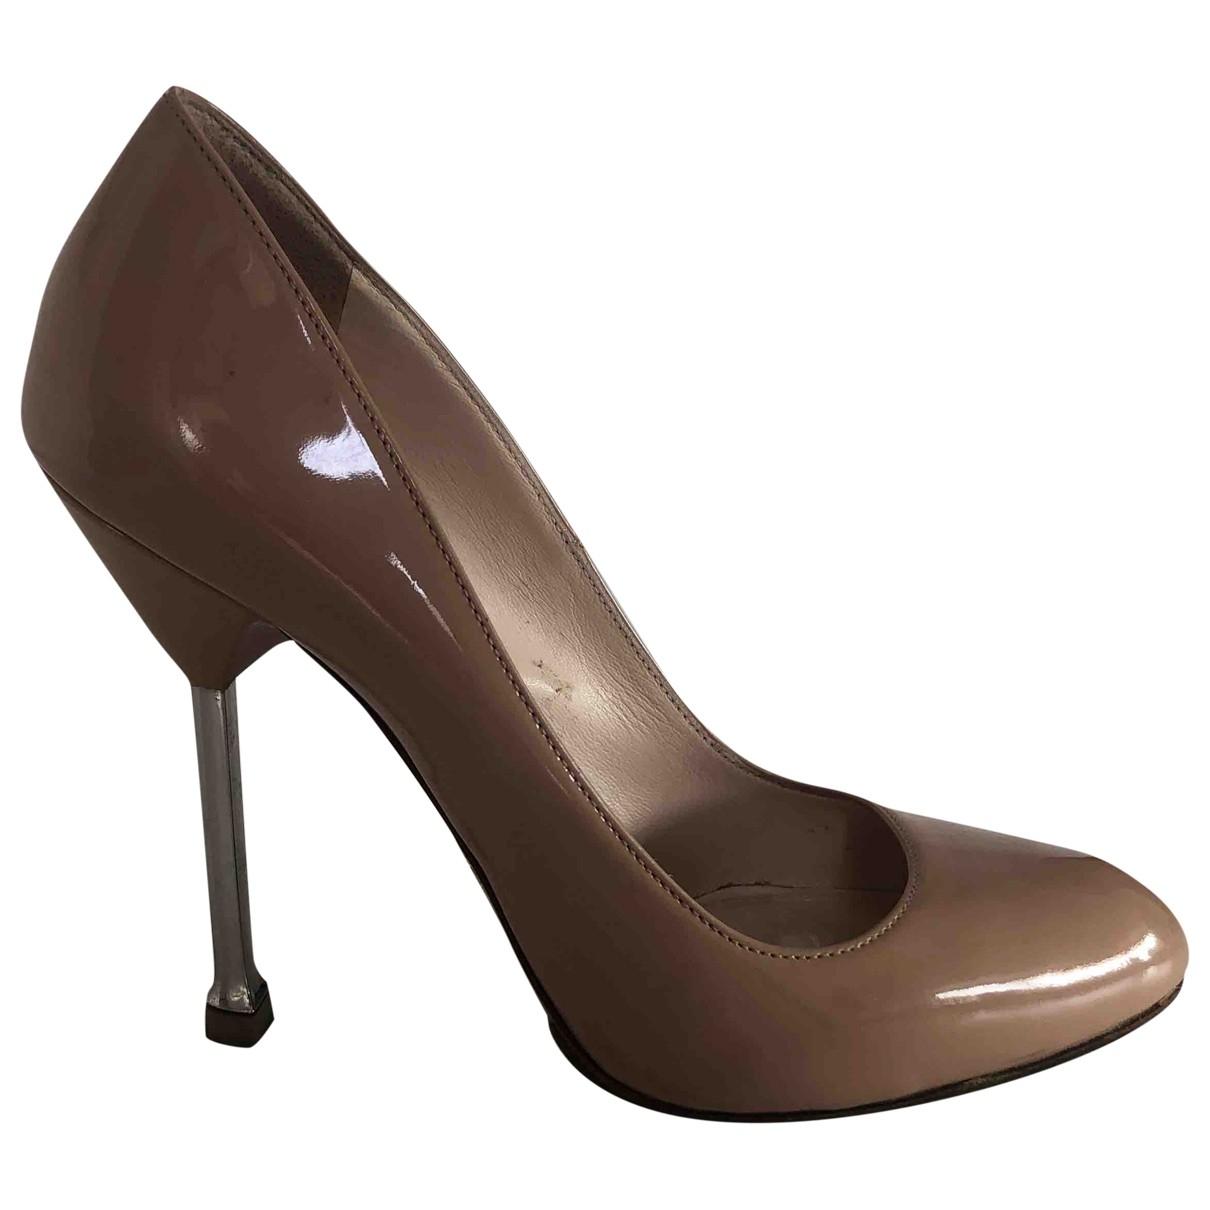 Prada \N Beige Patent leather Heels for Women 38.5 EU